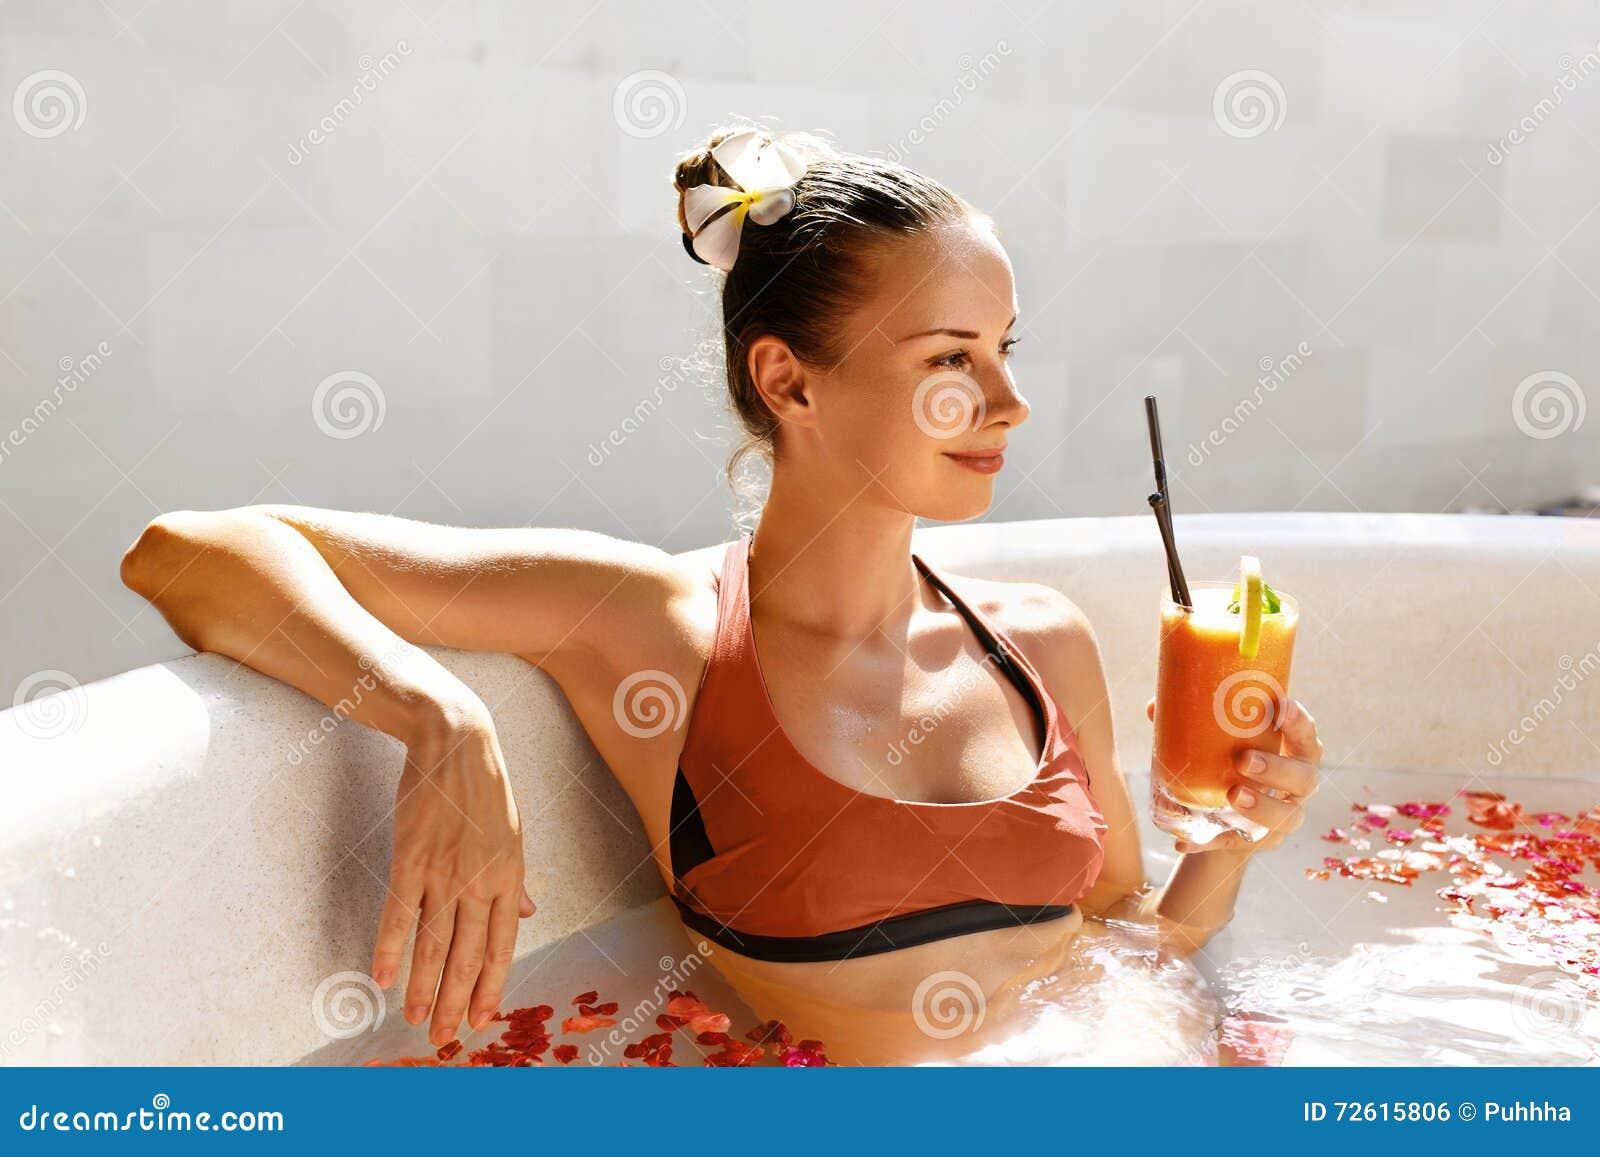 56a237b74b445 Beautiful Happy Smiling Woman Drinking Fresh Detox Juice Cocktail